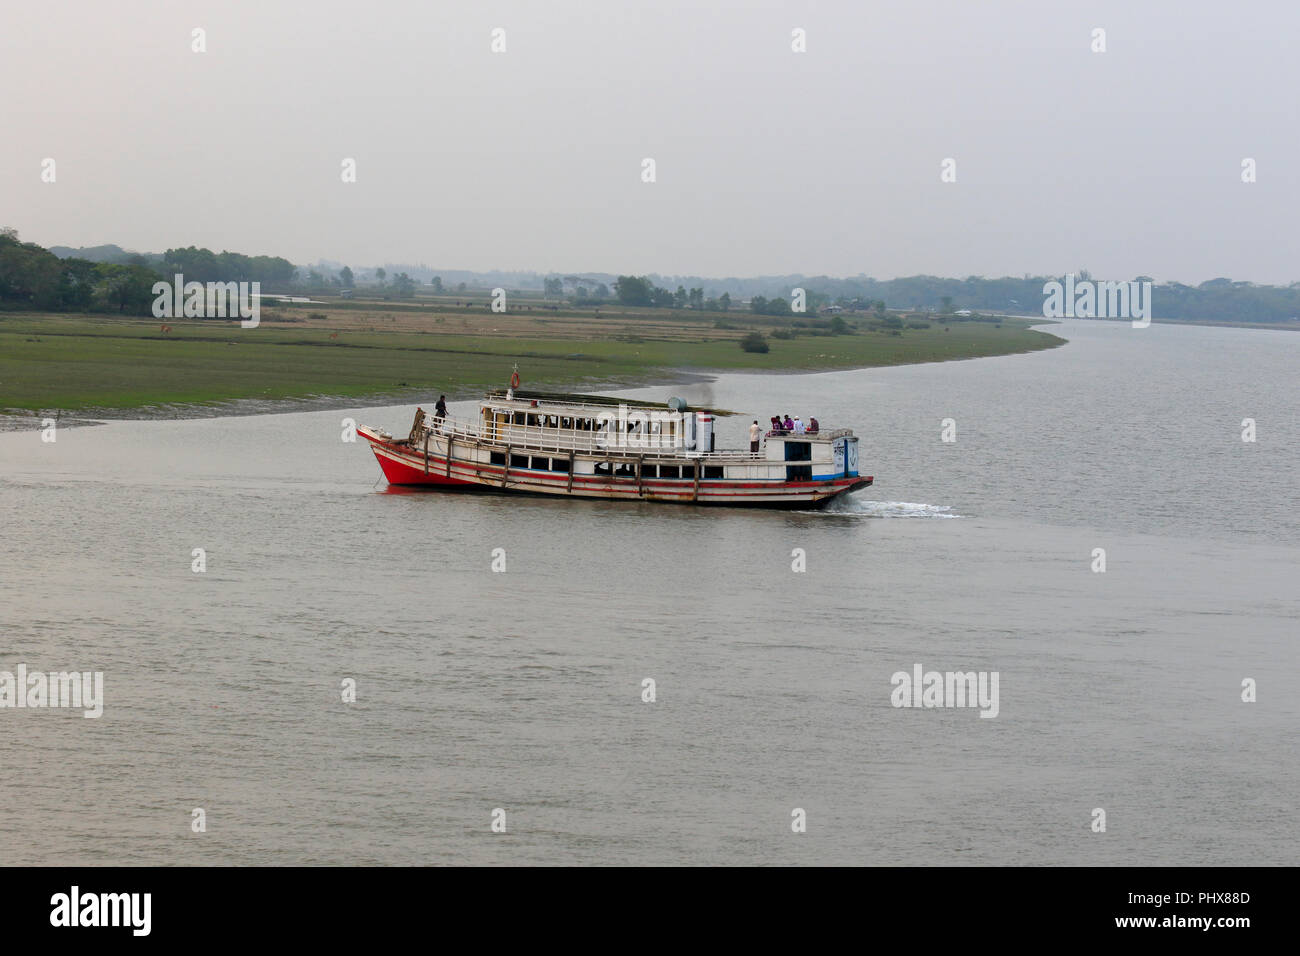 A small passenger vessel on Tetulia River, Patuakhali, Bangladesh. - Stock Image